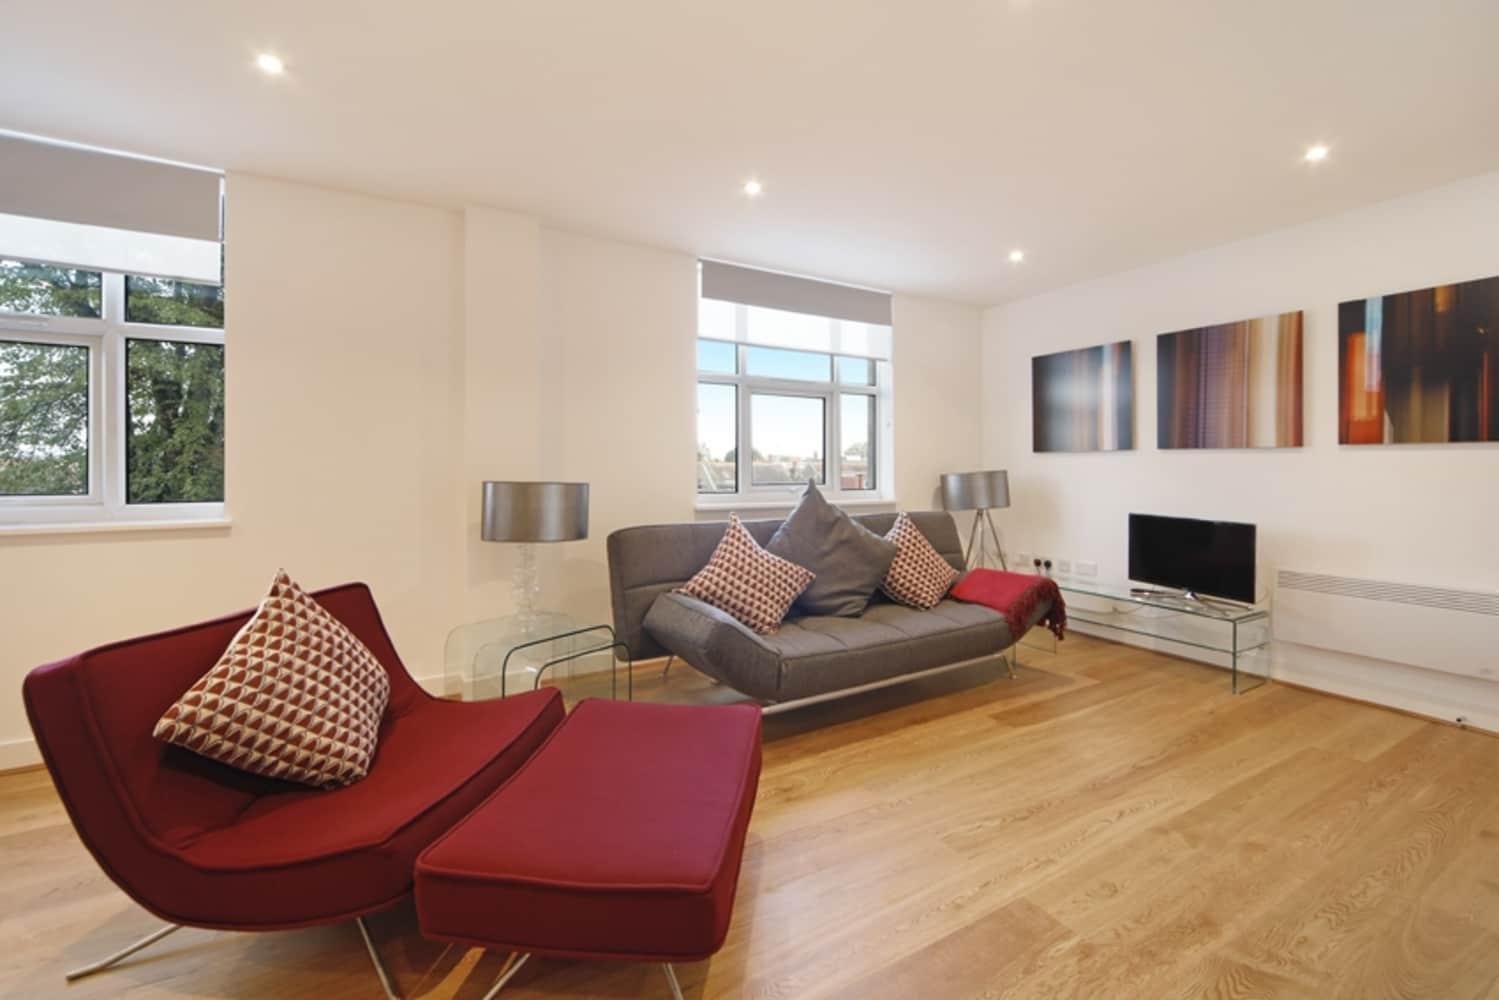 Apartment London, W3 - Bromyard Avenue London W3 - 06